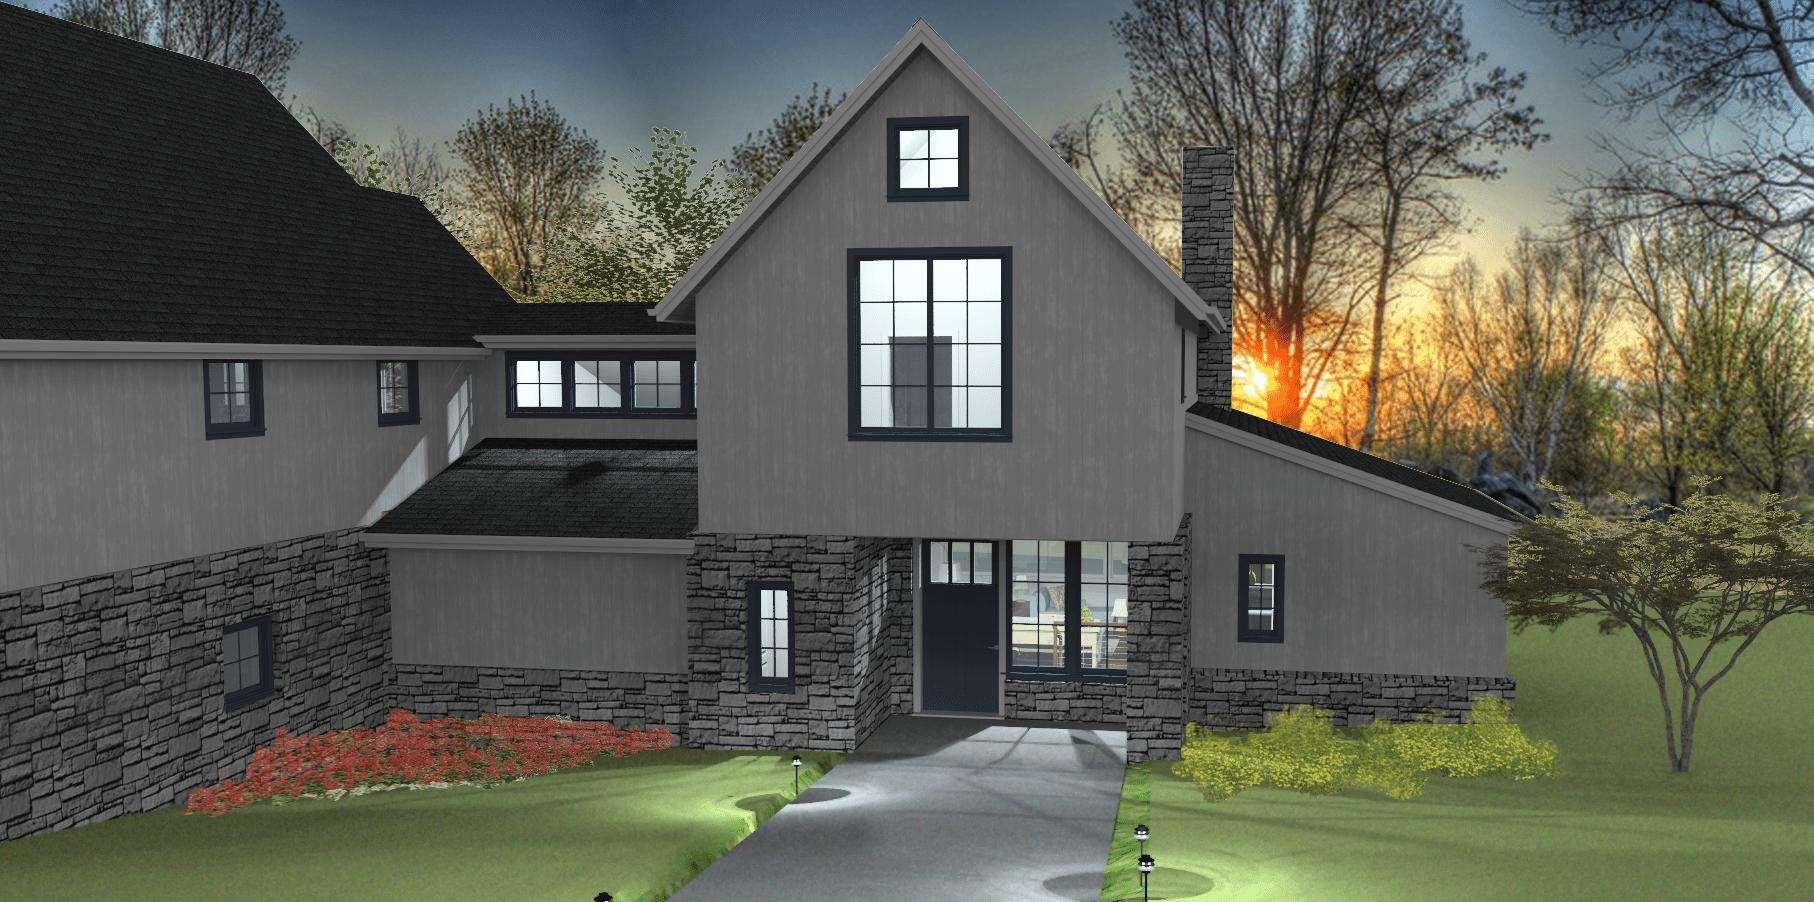 5 Wyndam Court - Farmhouse 3D model rendering at night